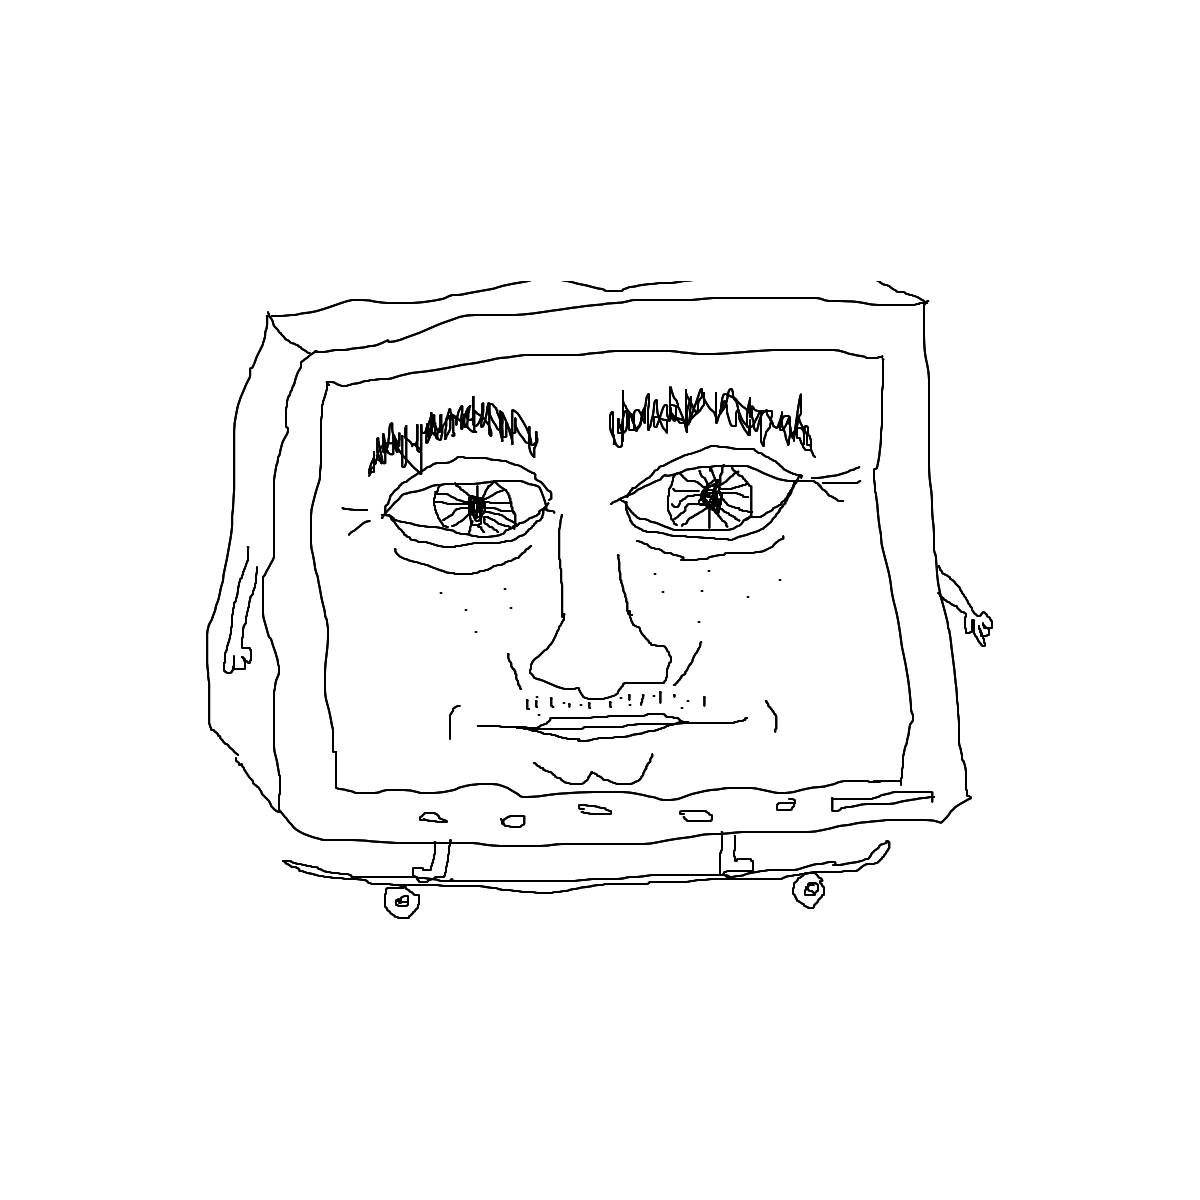 BAAAM drawing#16405 lat:35.8669853210449200lng: -78.6752166748046900